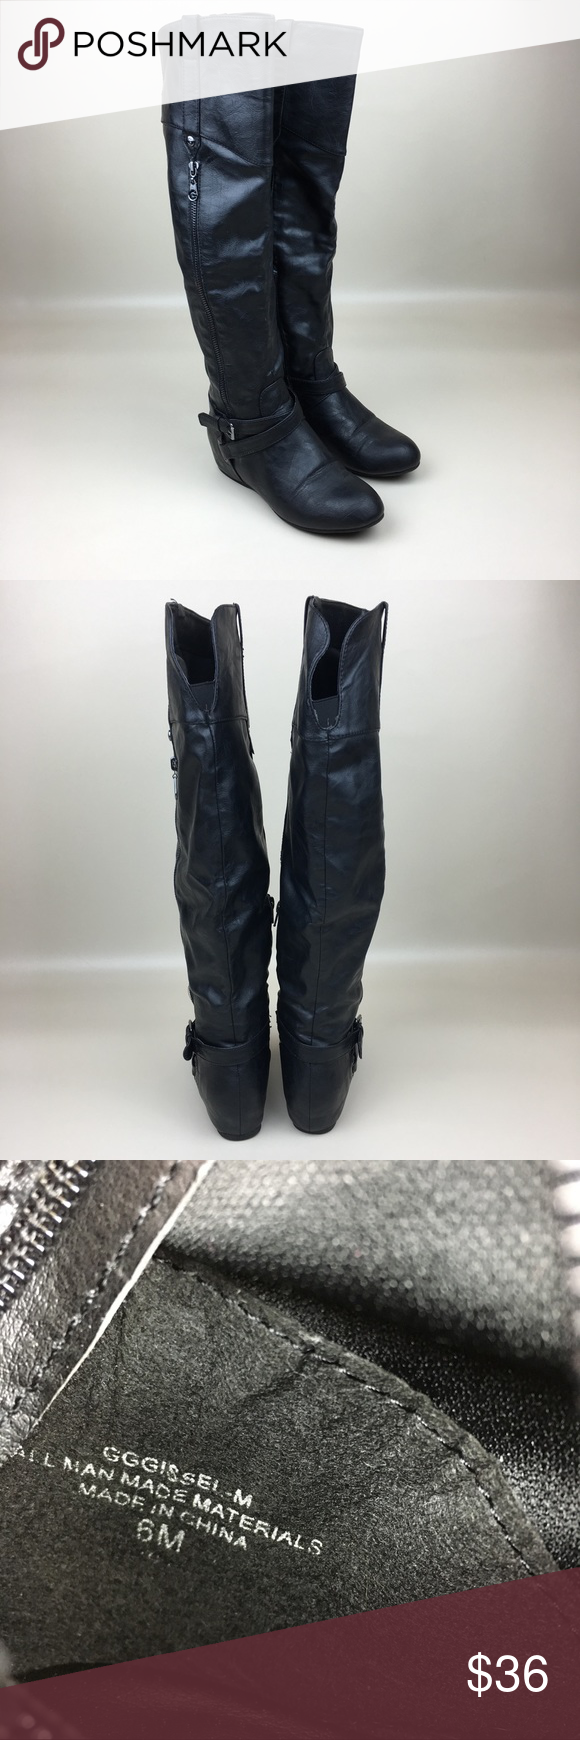 e06d8a75f82e GUESS Gissel Black Over-Knee Hidden Wedge Boots G by GUESS Gissel Black Over -